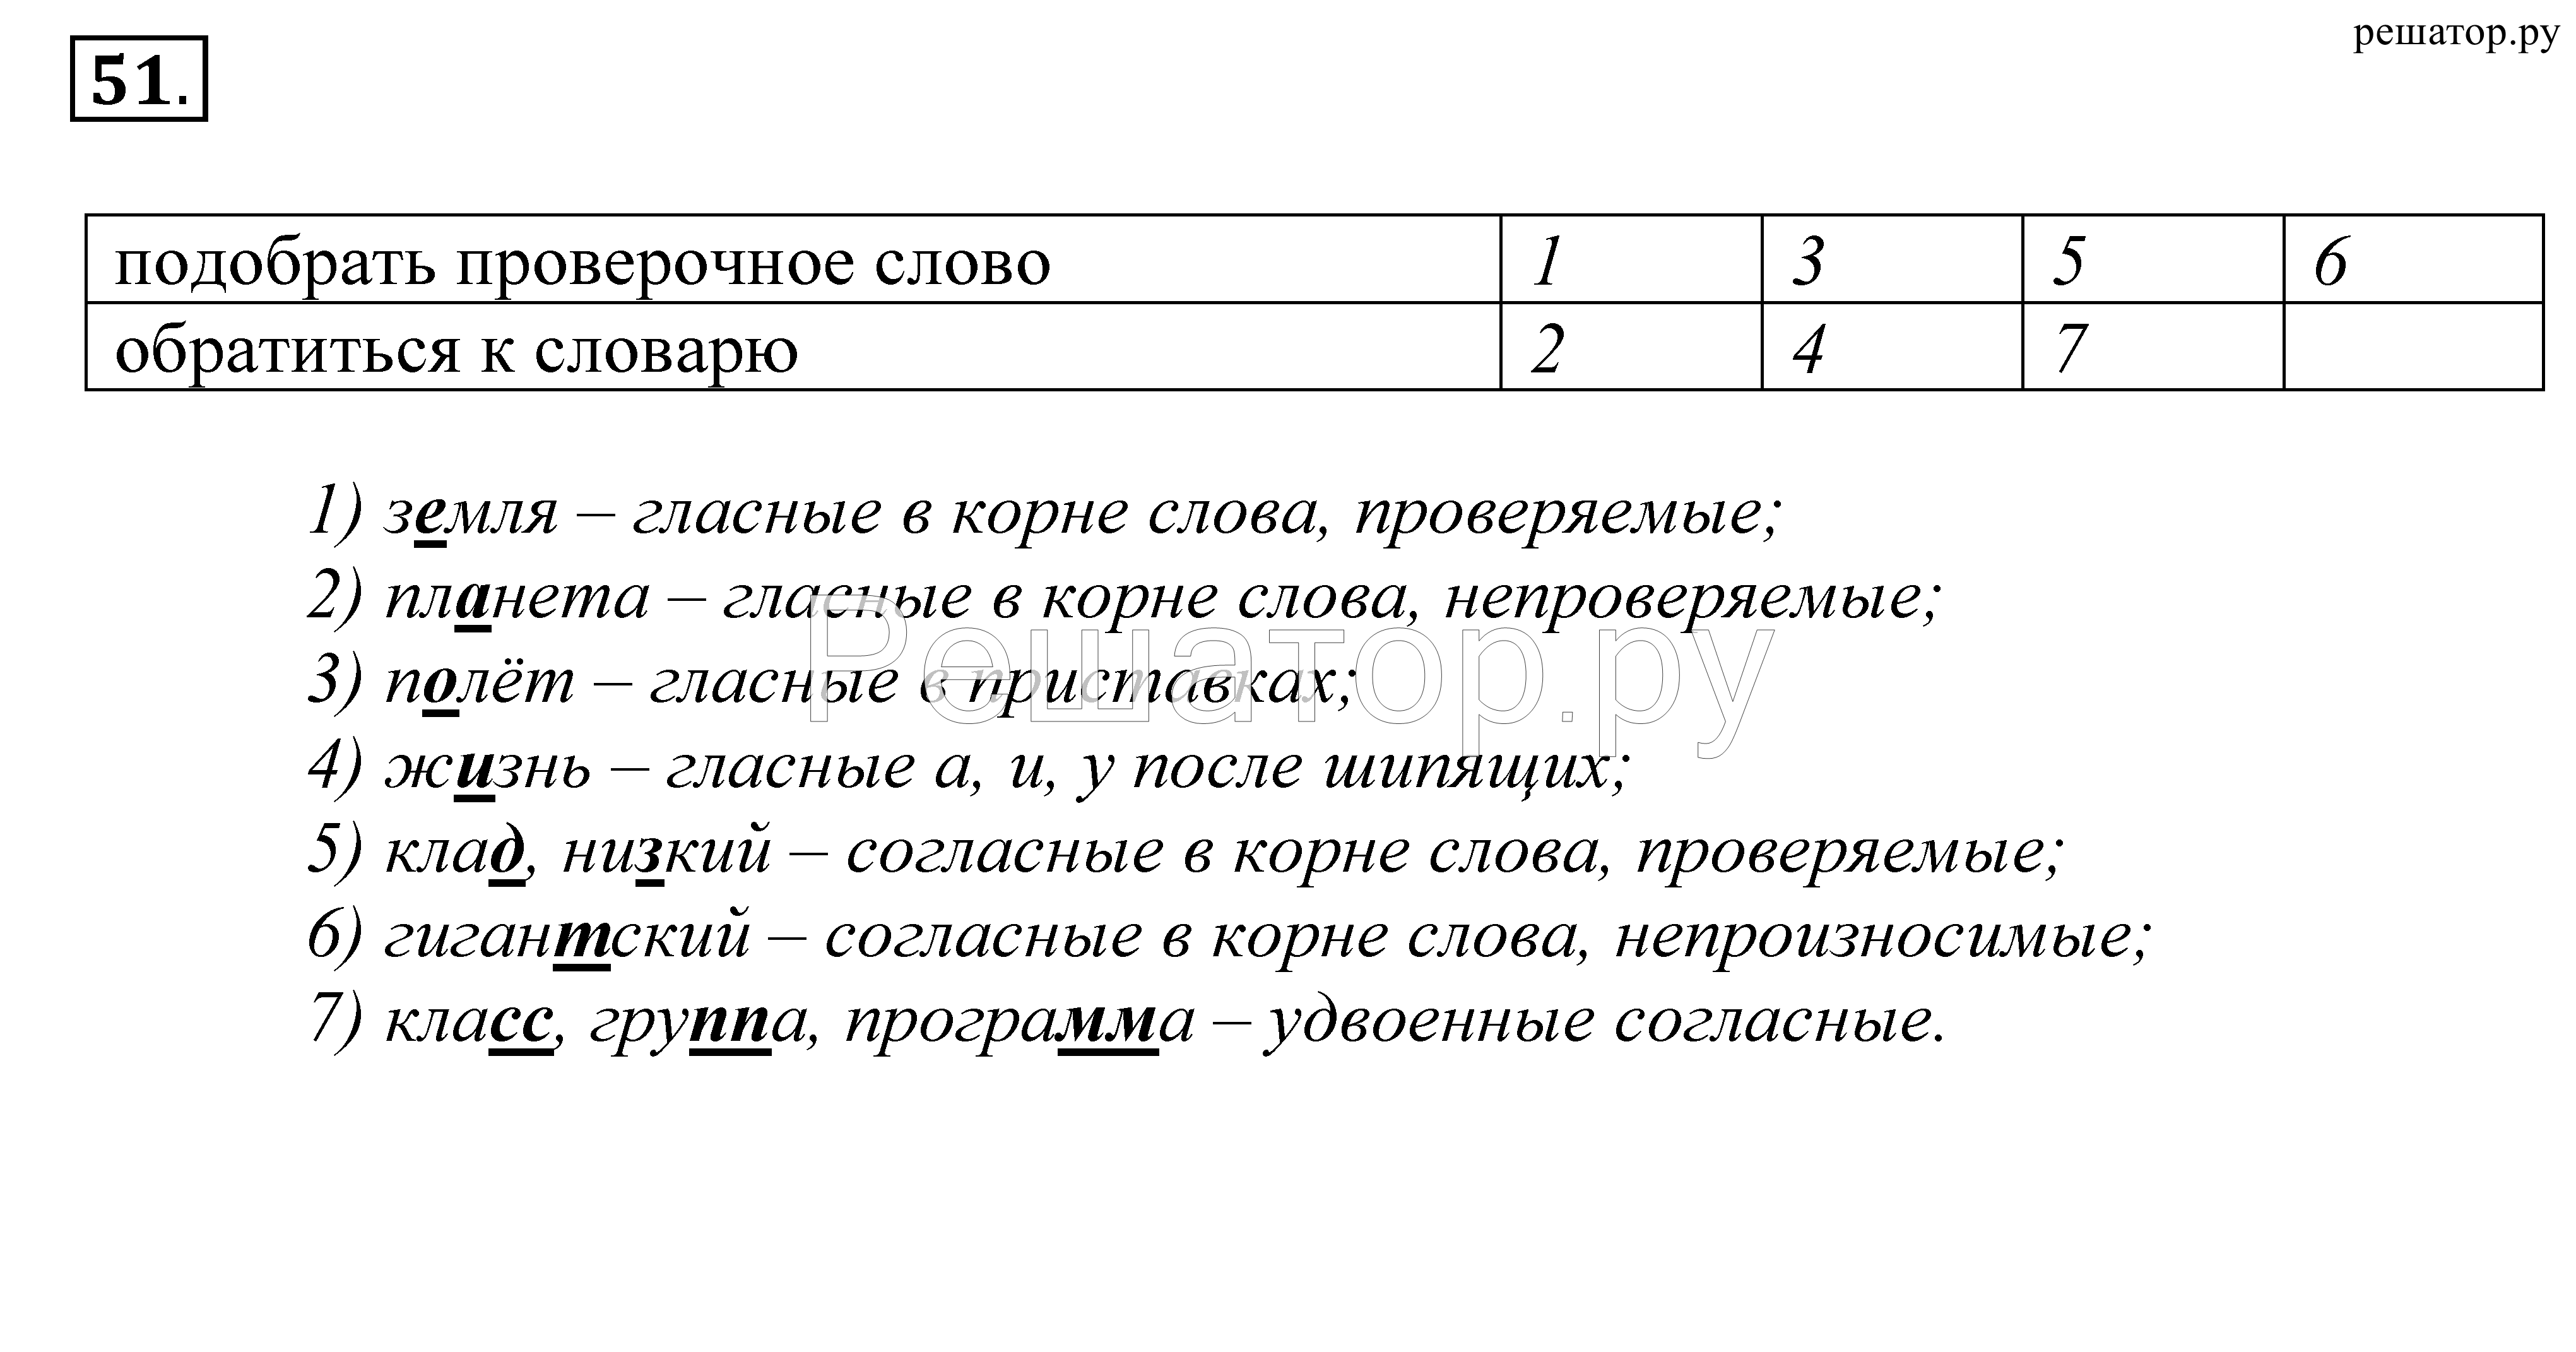 Гдз по русскому практика 5 класс купалова еремеева орлова